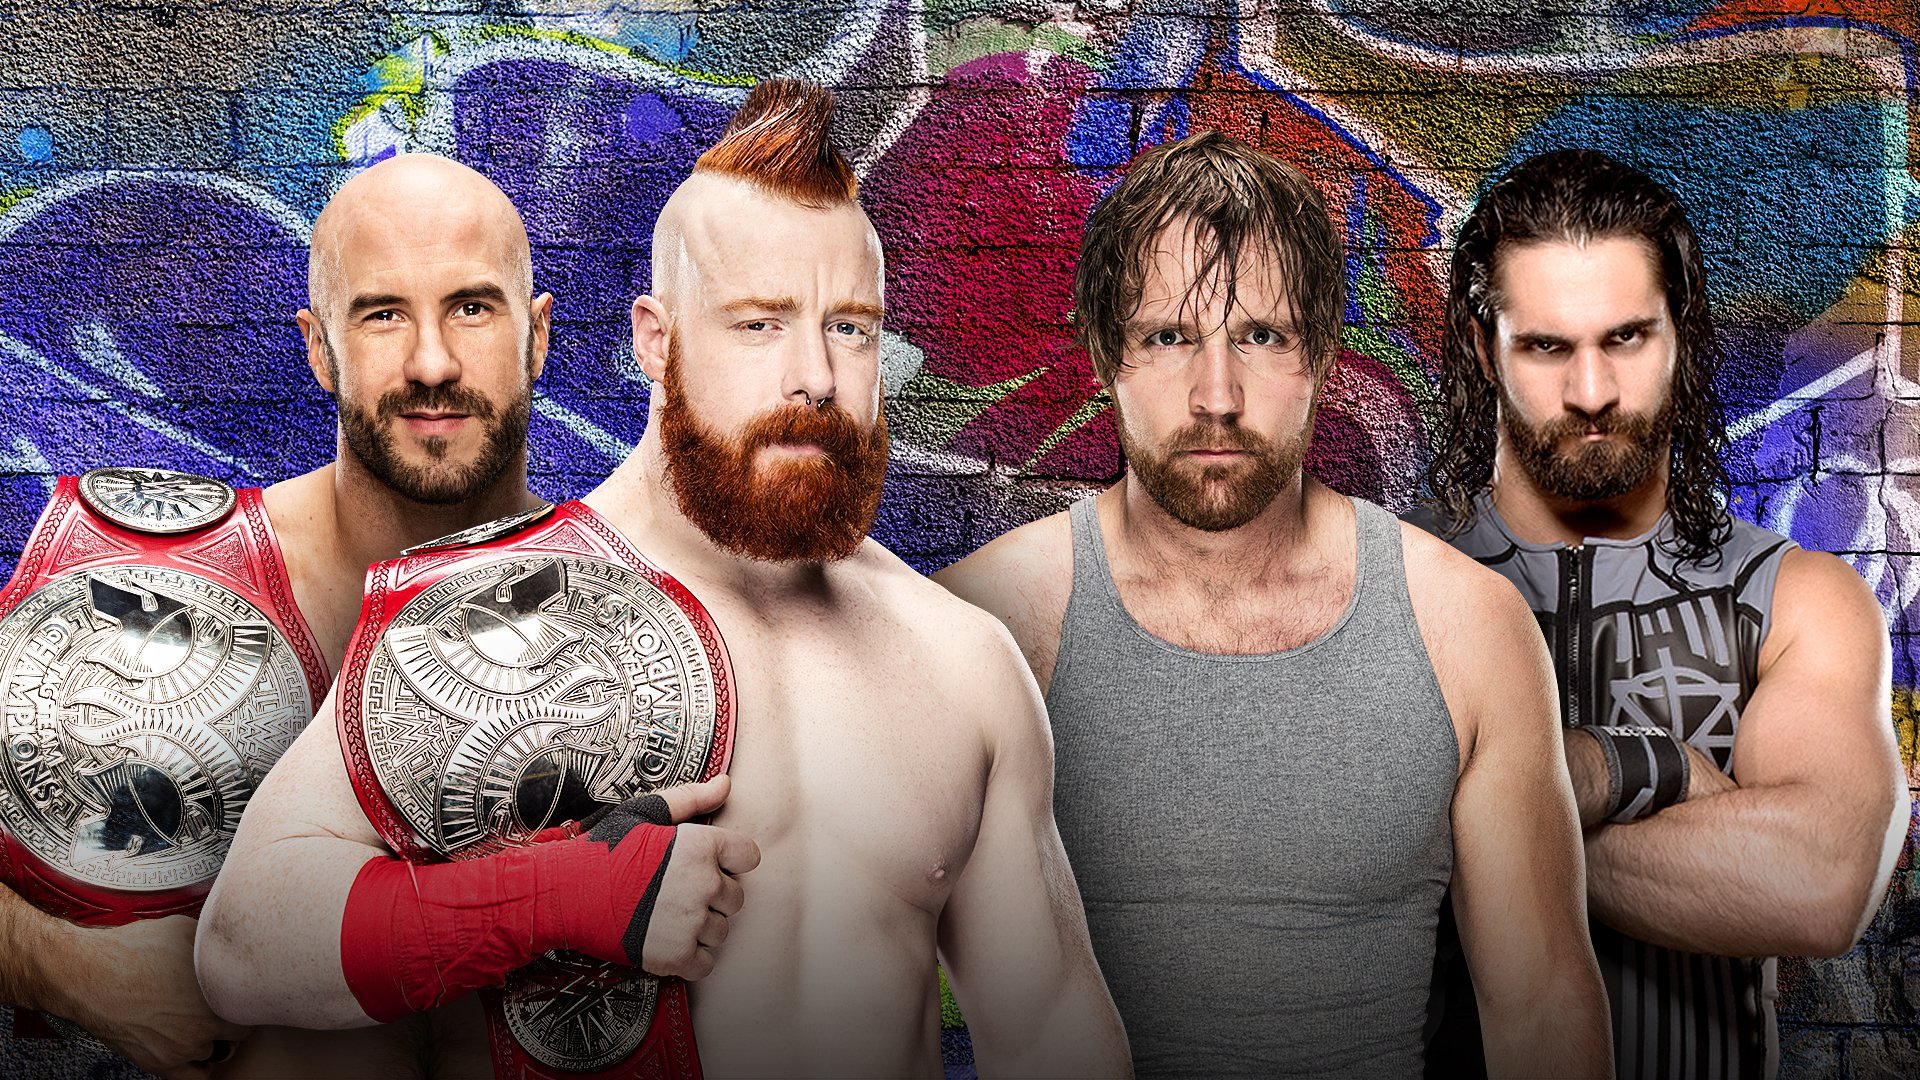 WWE SummerSlam 2017: Cesaro & Sheamus vs. Dean Ambrose & Seth Rollins